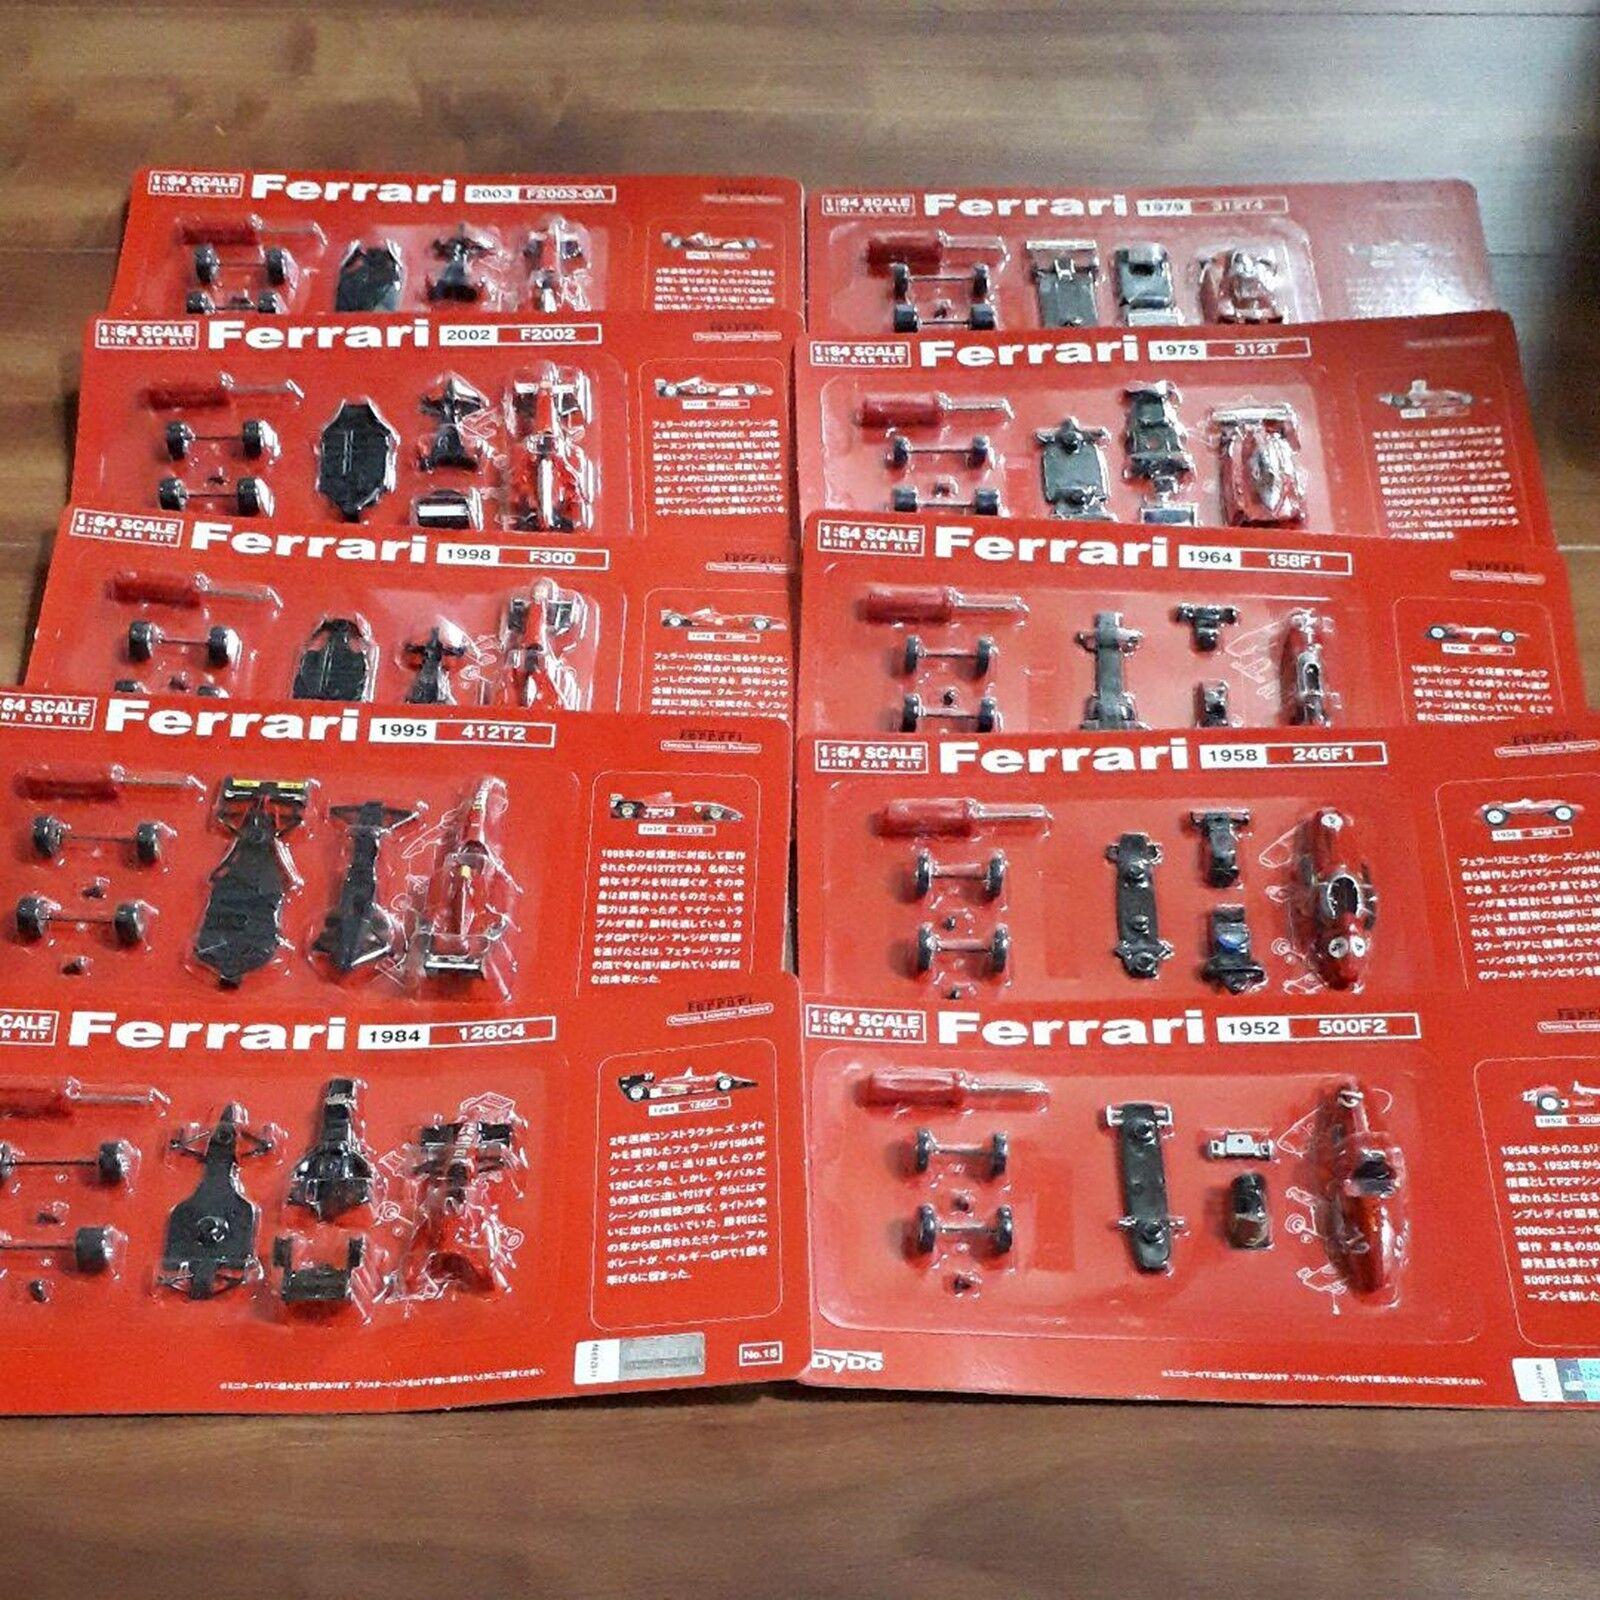 Ferrari 1 64 Kyosho x Dydo Promo F1 Vol.2 10 Cars lot Complete Unassembled F S